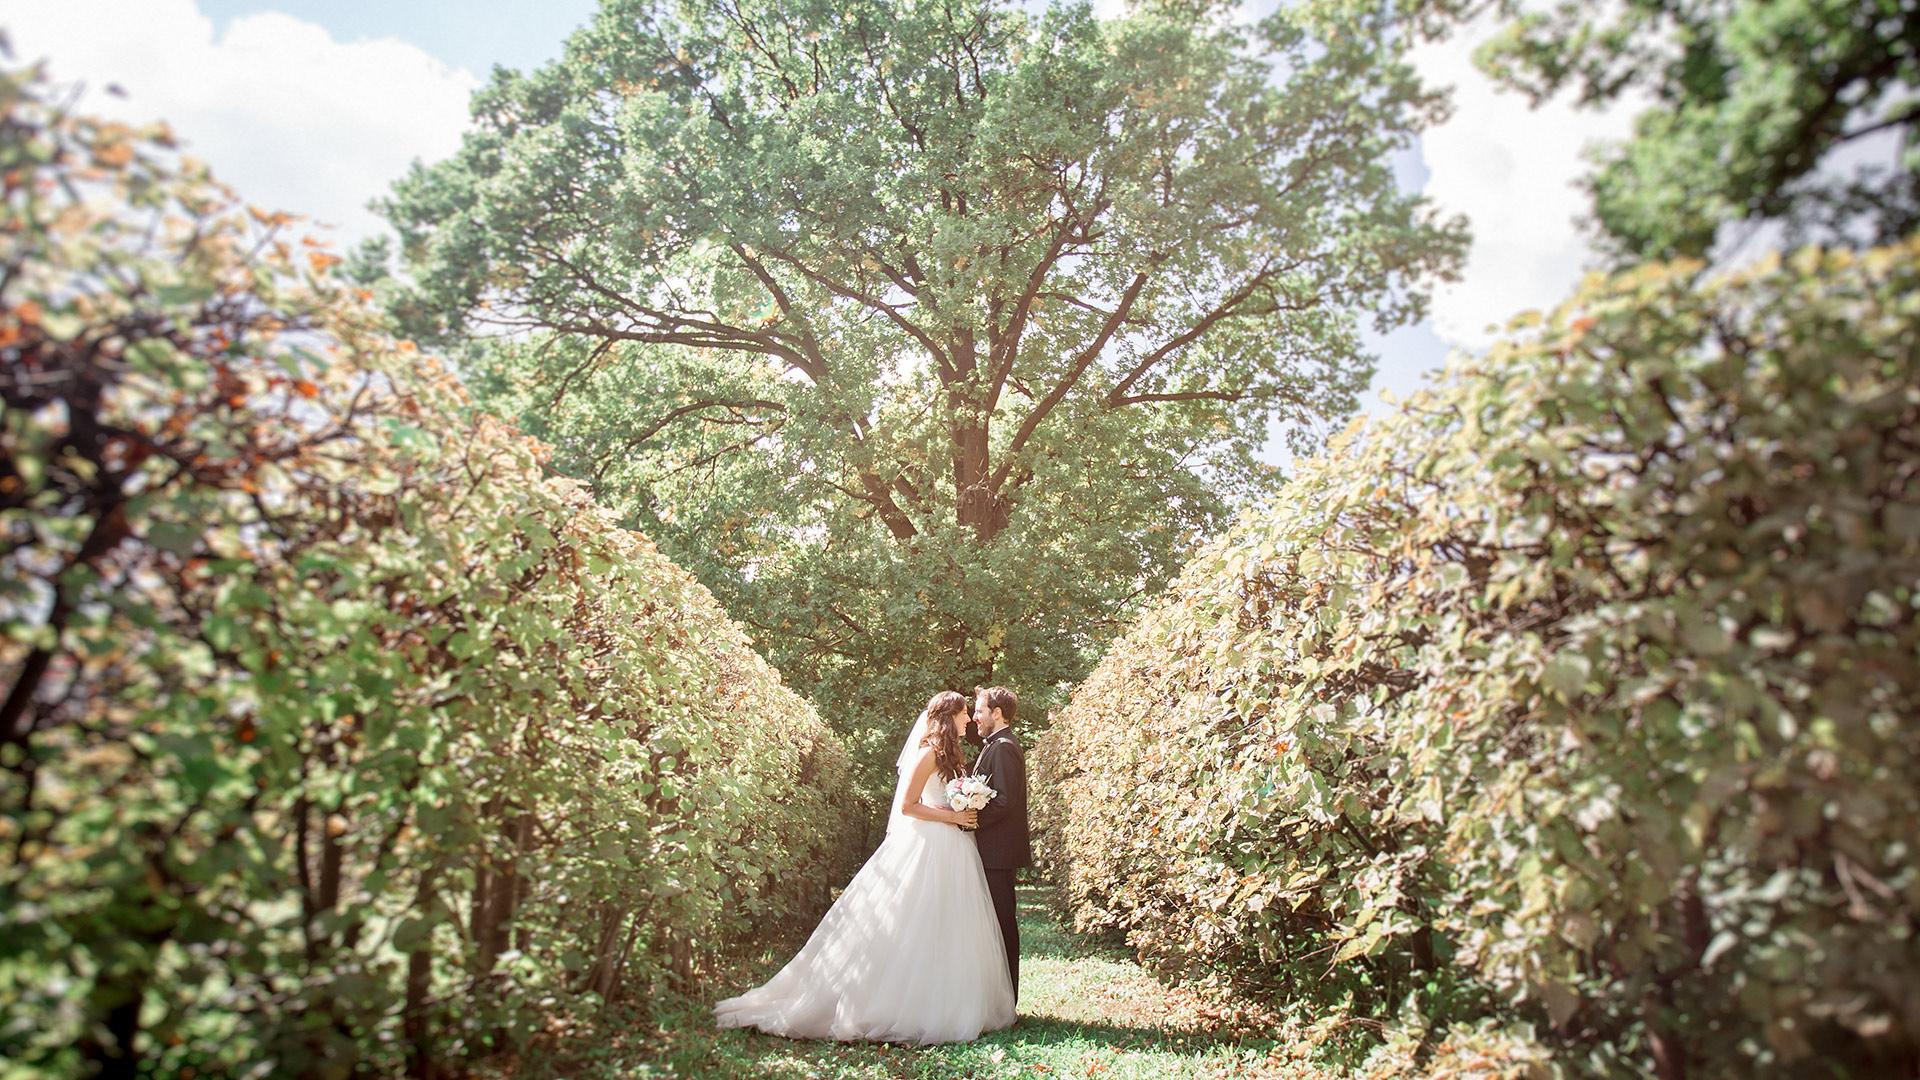 Фотограф на свадьбу файн арт